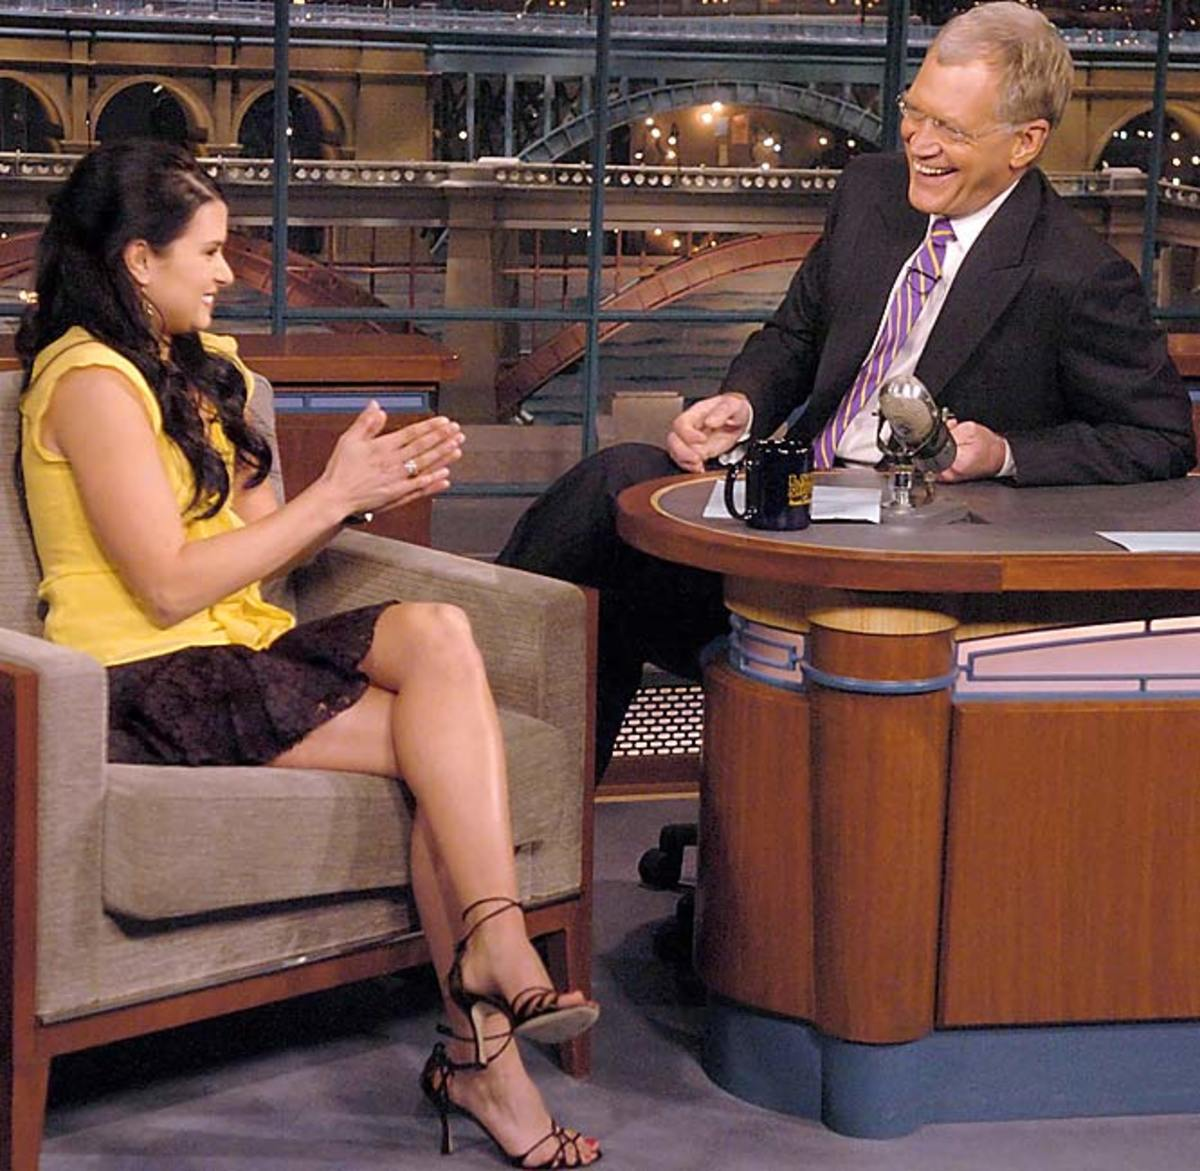 Danica Patrick/David Letterman